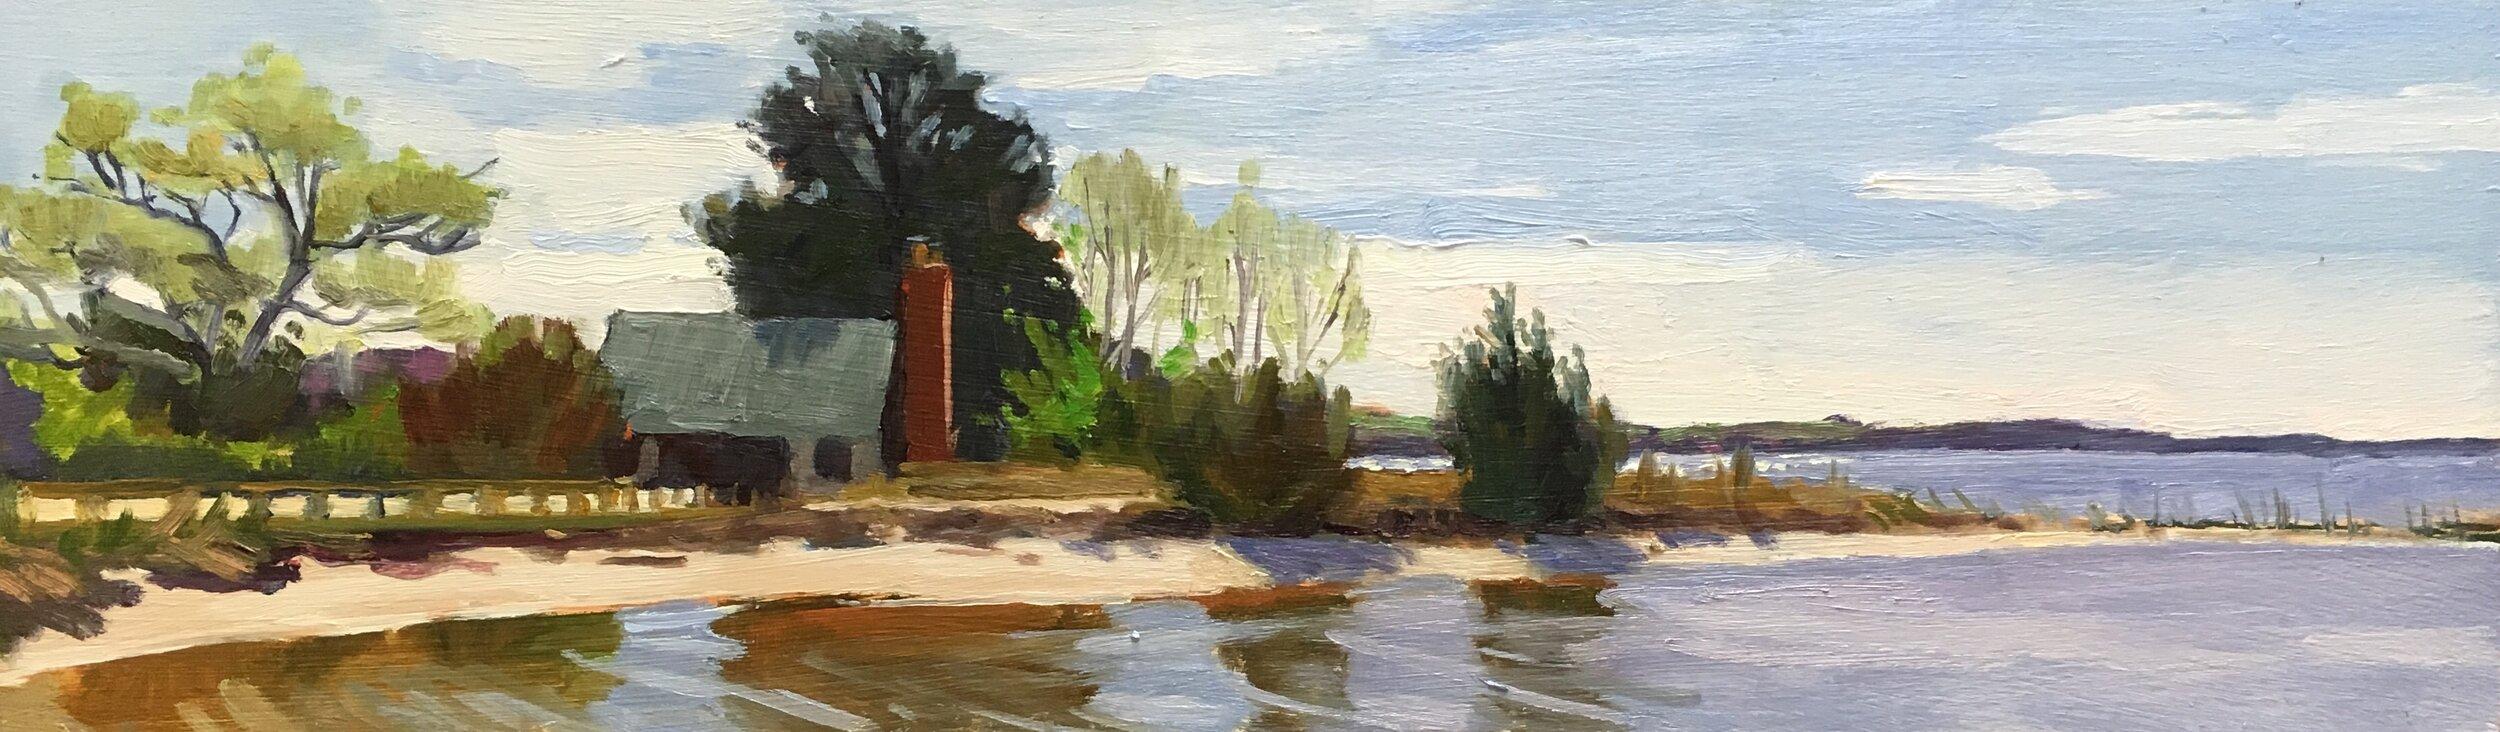 St. Leonard Creek